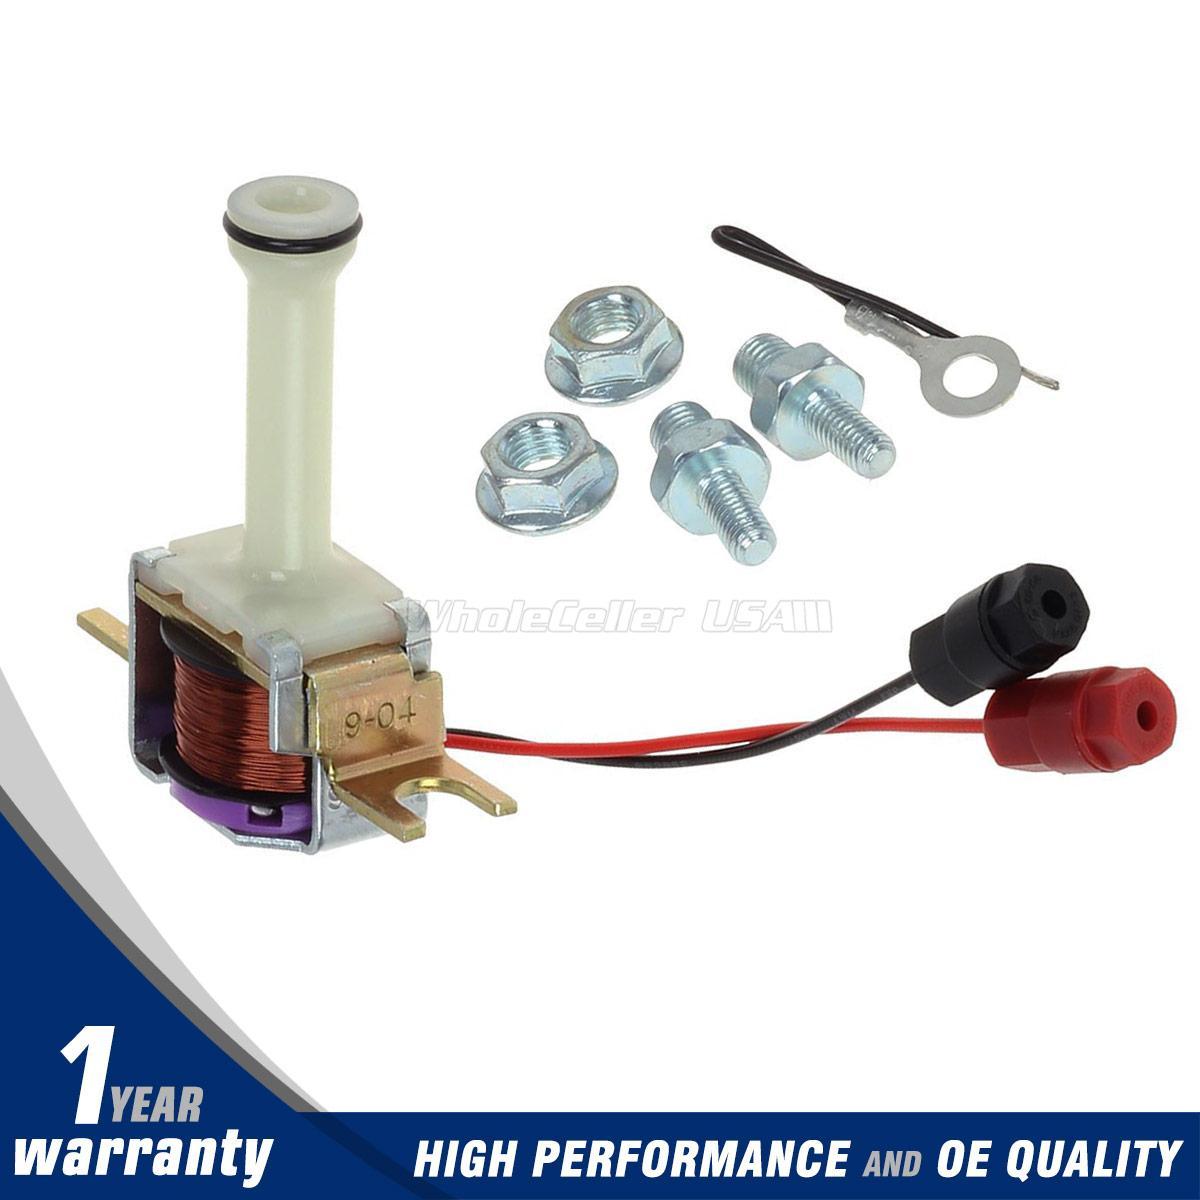 4l60e transmission lock up wiring diagram transmission lock up solenoid 200 r4 4r th700 r4 4l60 4l60e tcc  r4 4r th700 r4 4l60 4l60e tcc